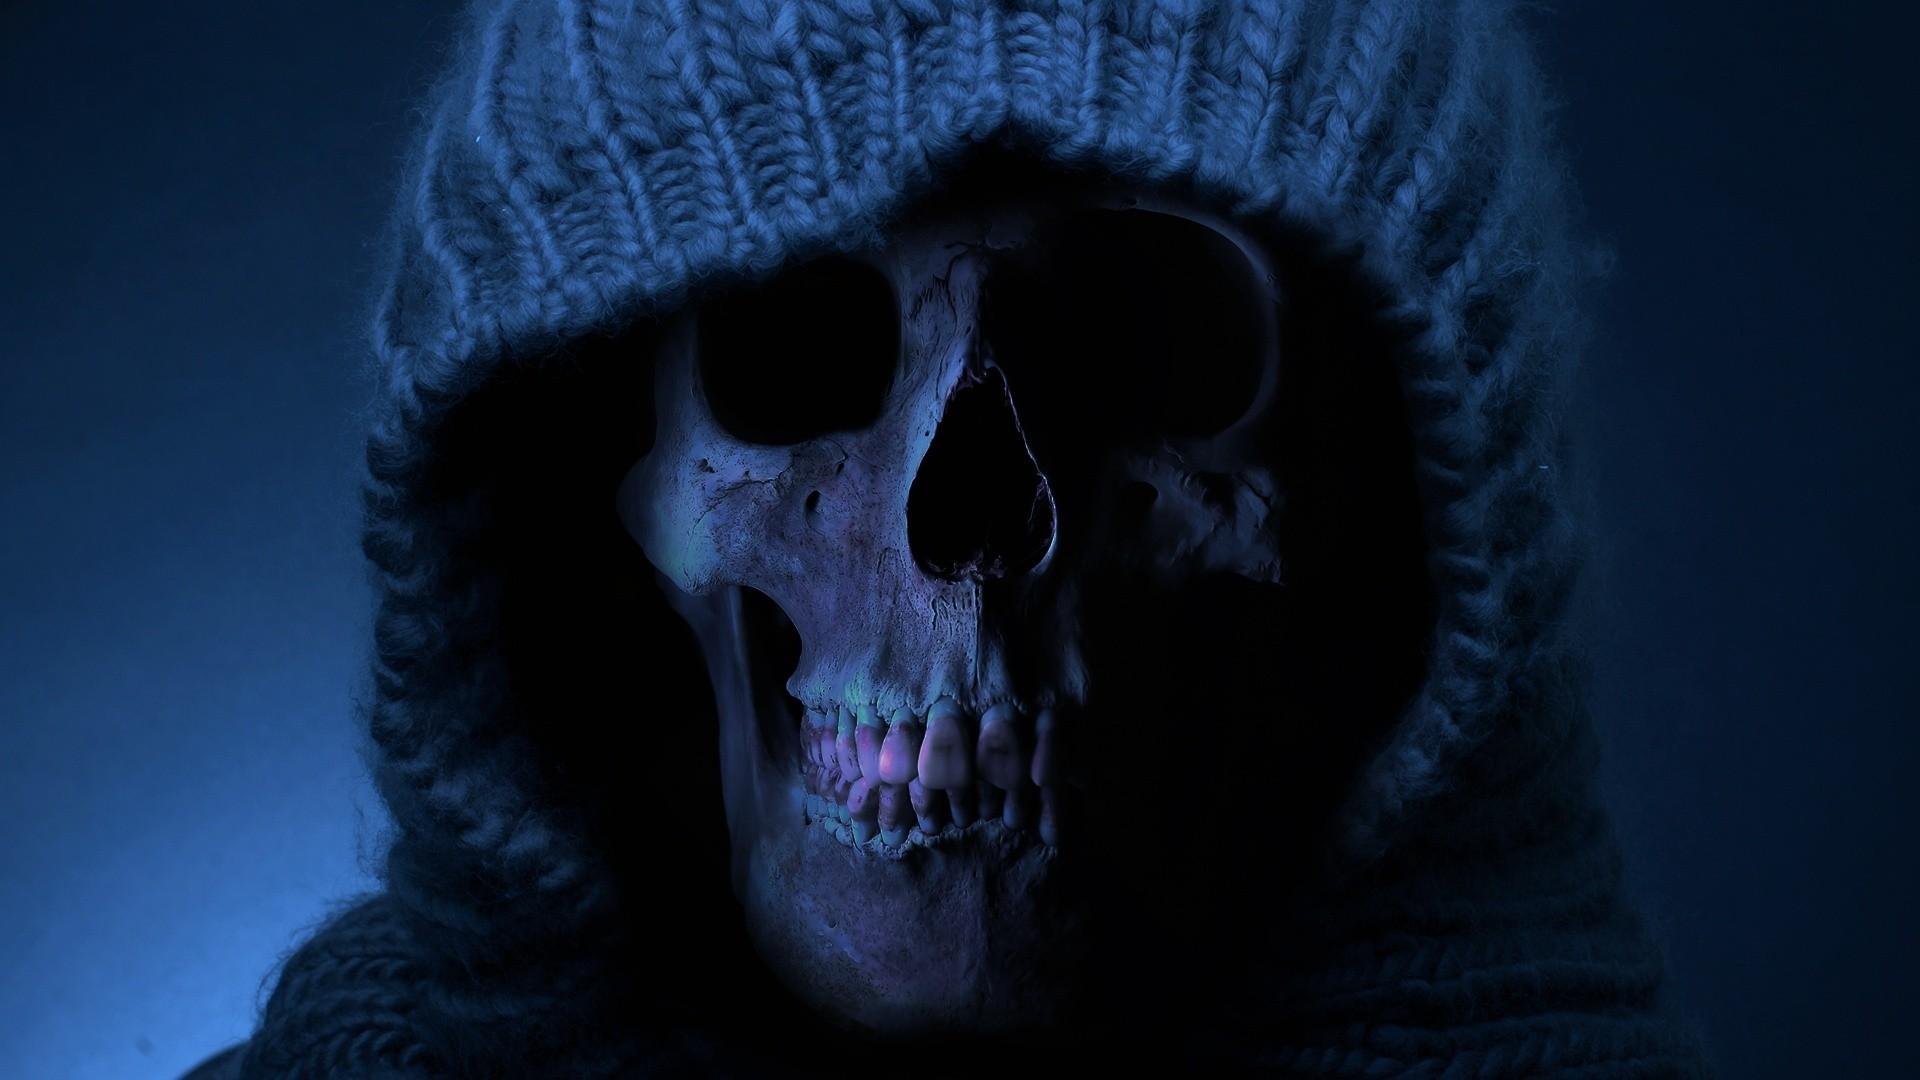 Name Live Wallpaper 3d Skull Wallpapers Death Hd Desktop Wallpapers 4k Hd